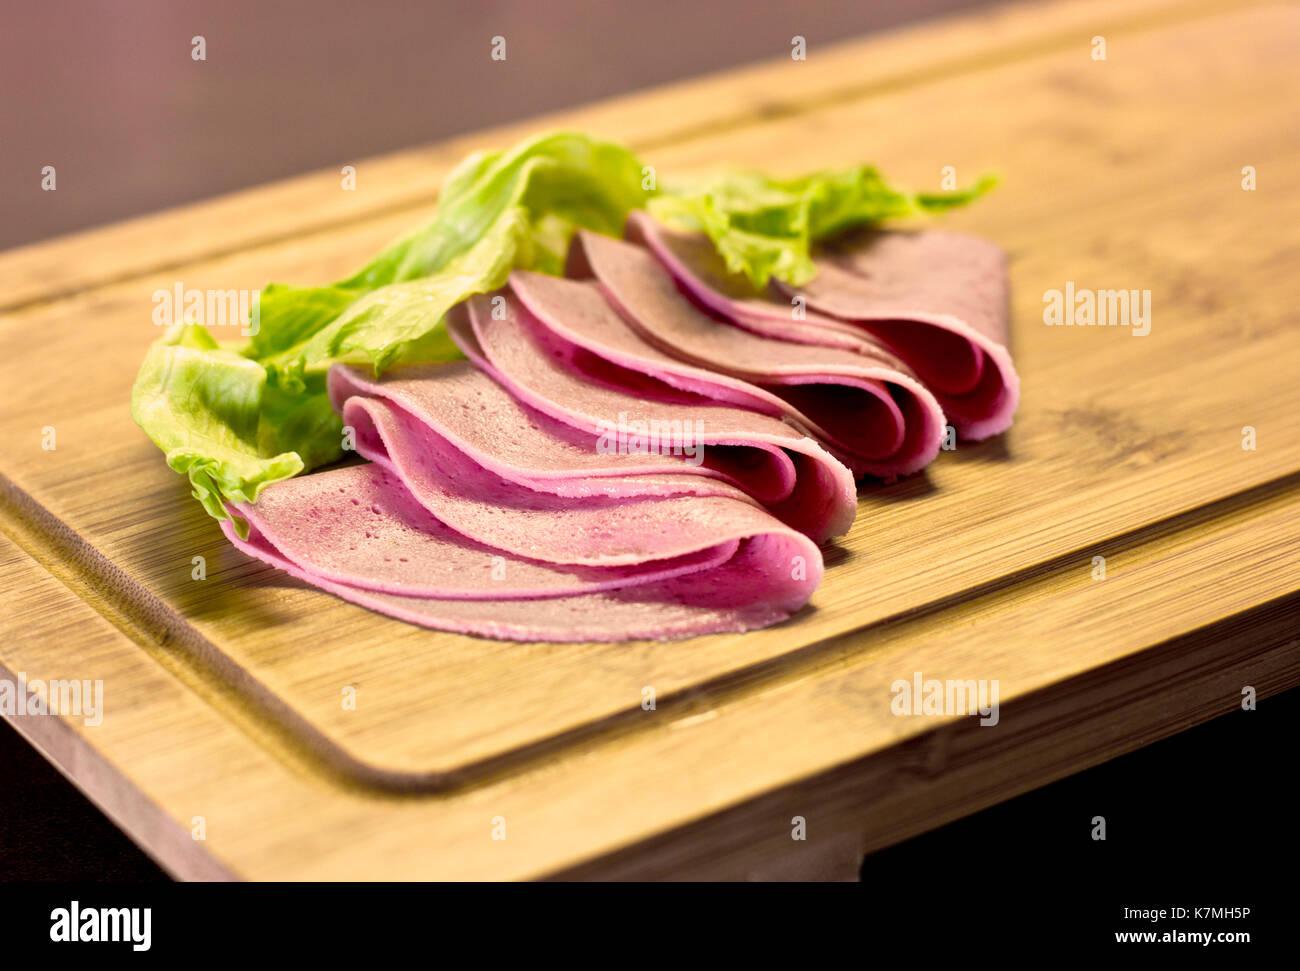 Dünn geschnittene Wurst mit grünem Salat auf Holzbrett Stockbild